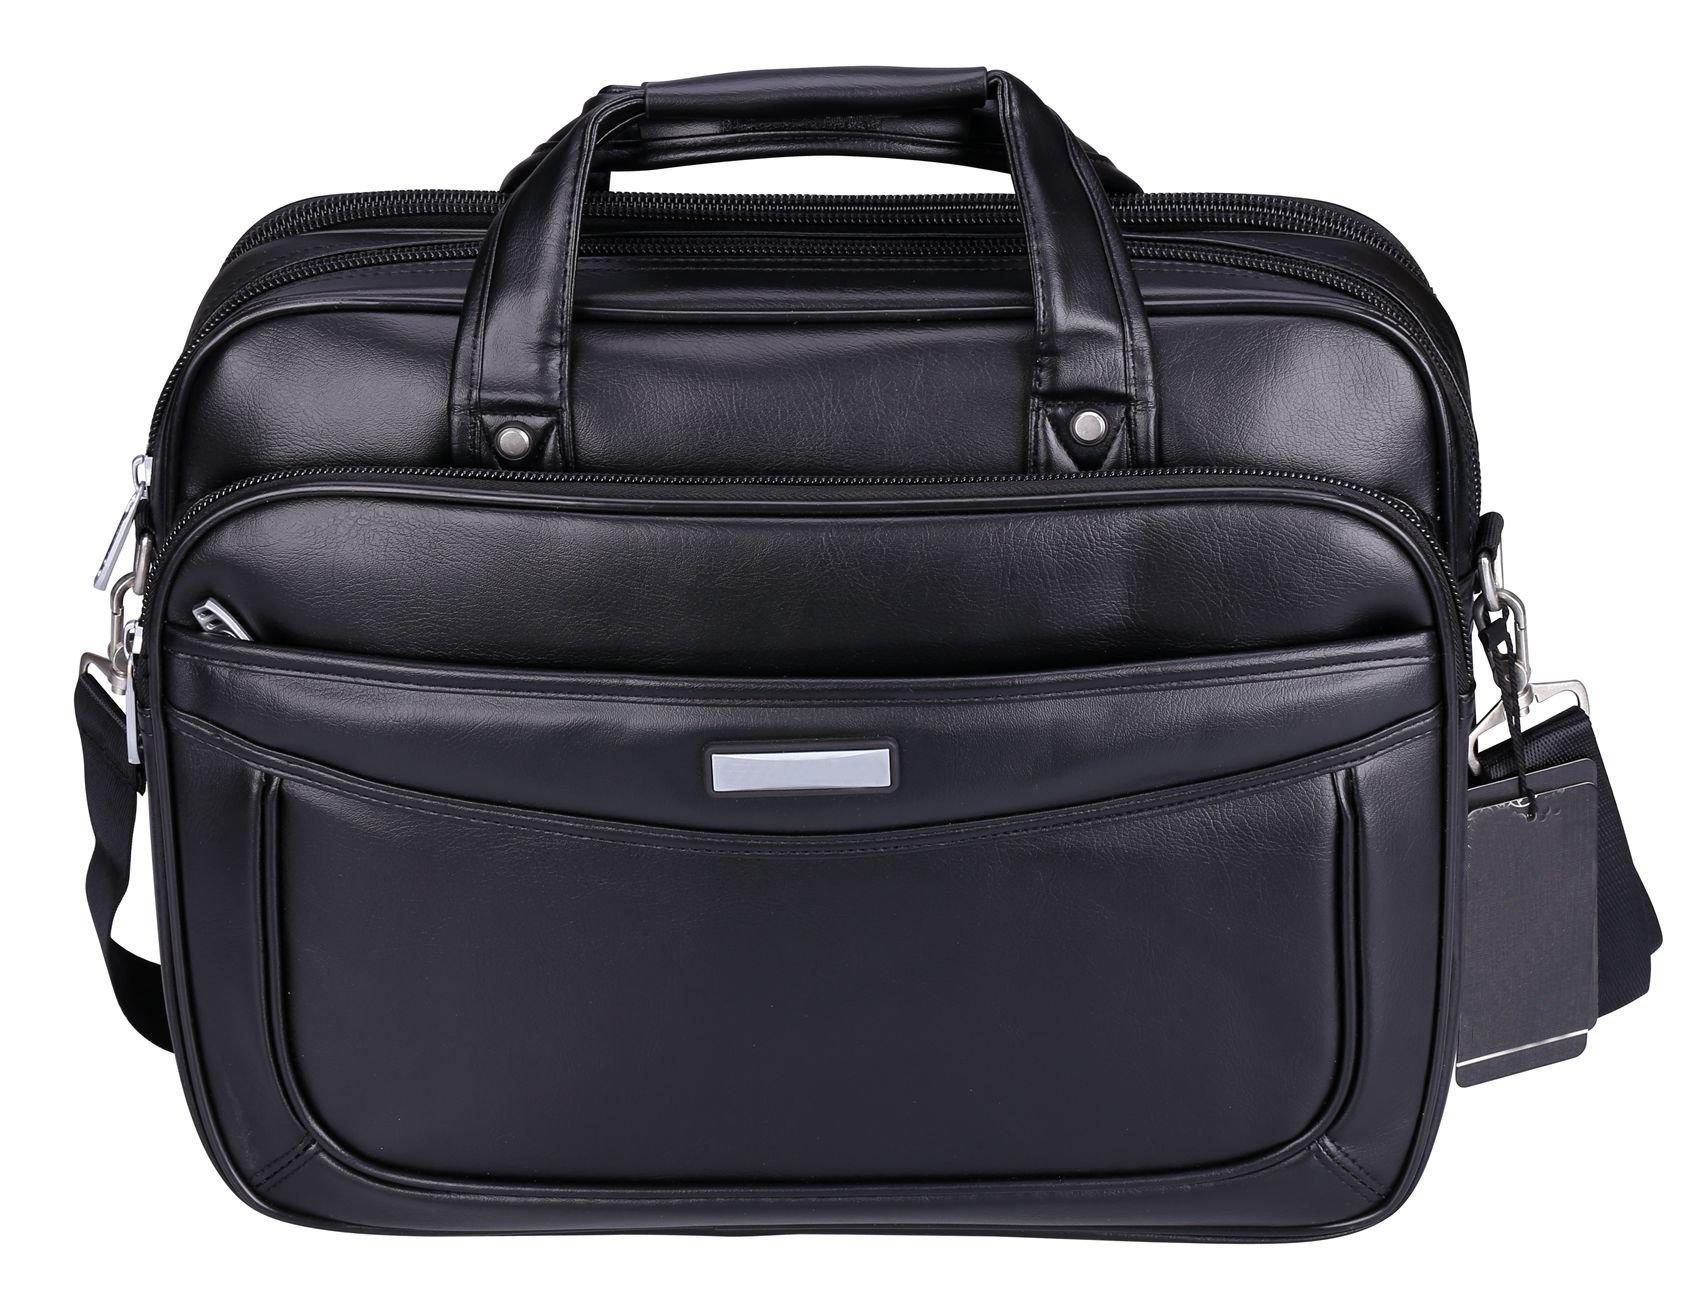 VIDENG Leather Business Briefcase,Extended 15.6 inch Laptop Bag,Large Capacity Shoulder Bags Travel Handbag for Mens and Womens (Black-M1)